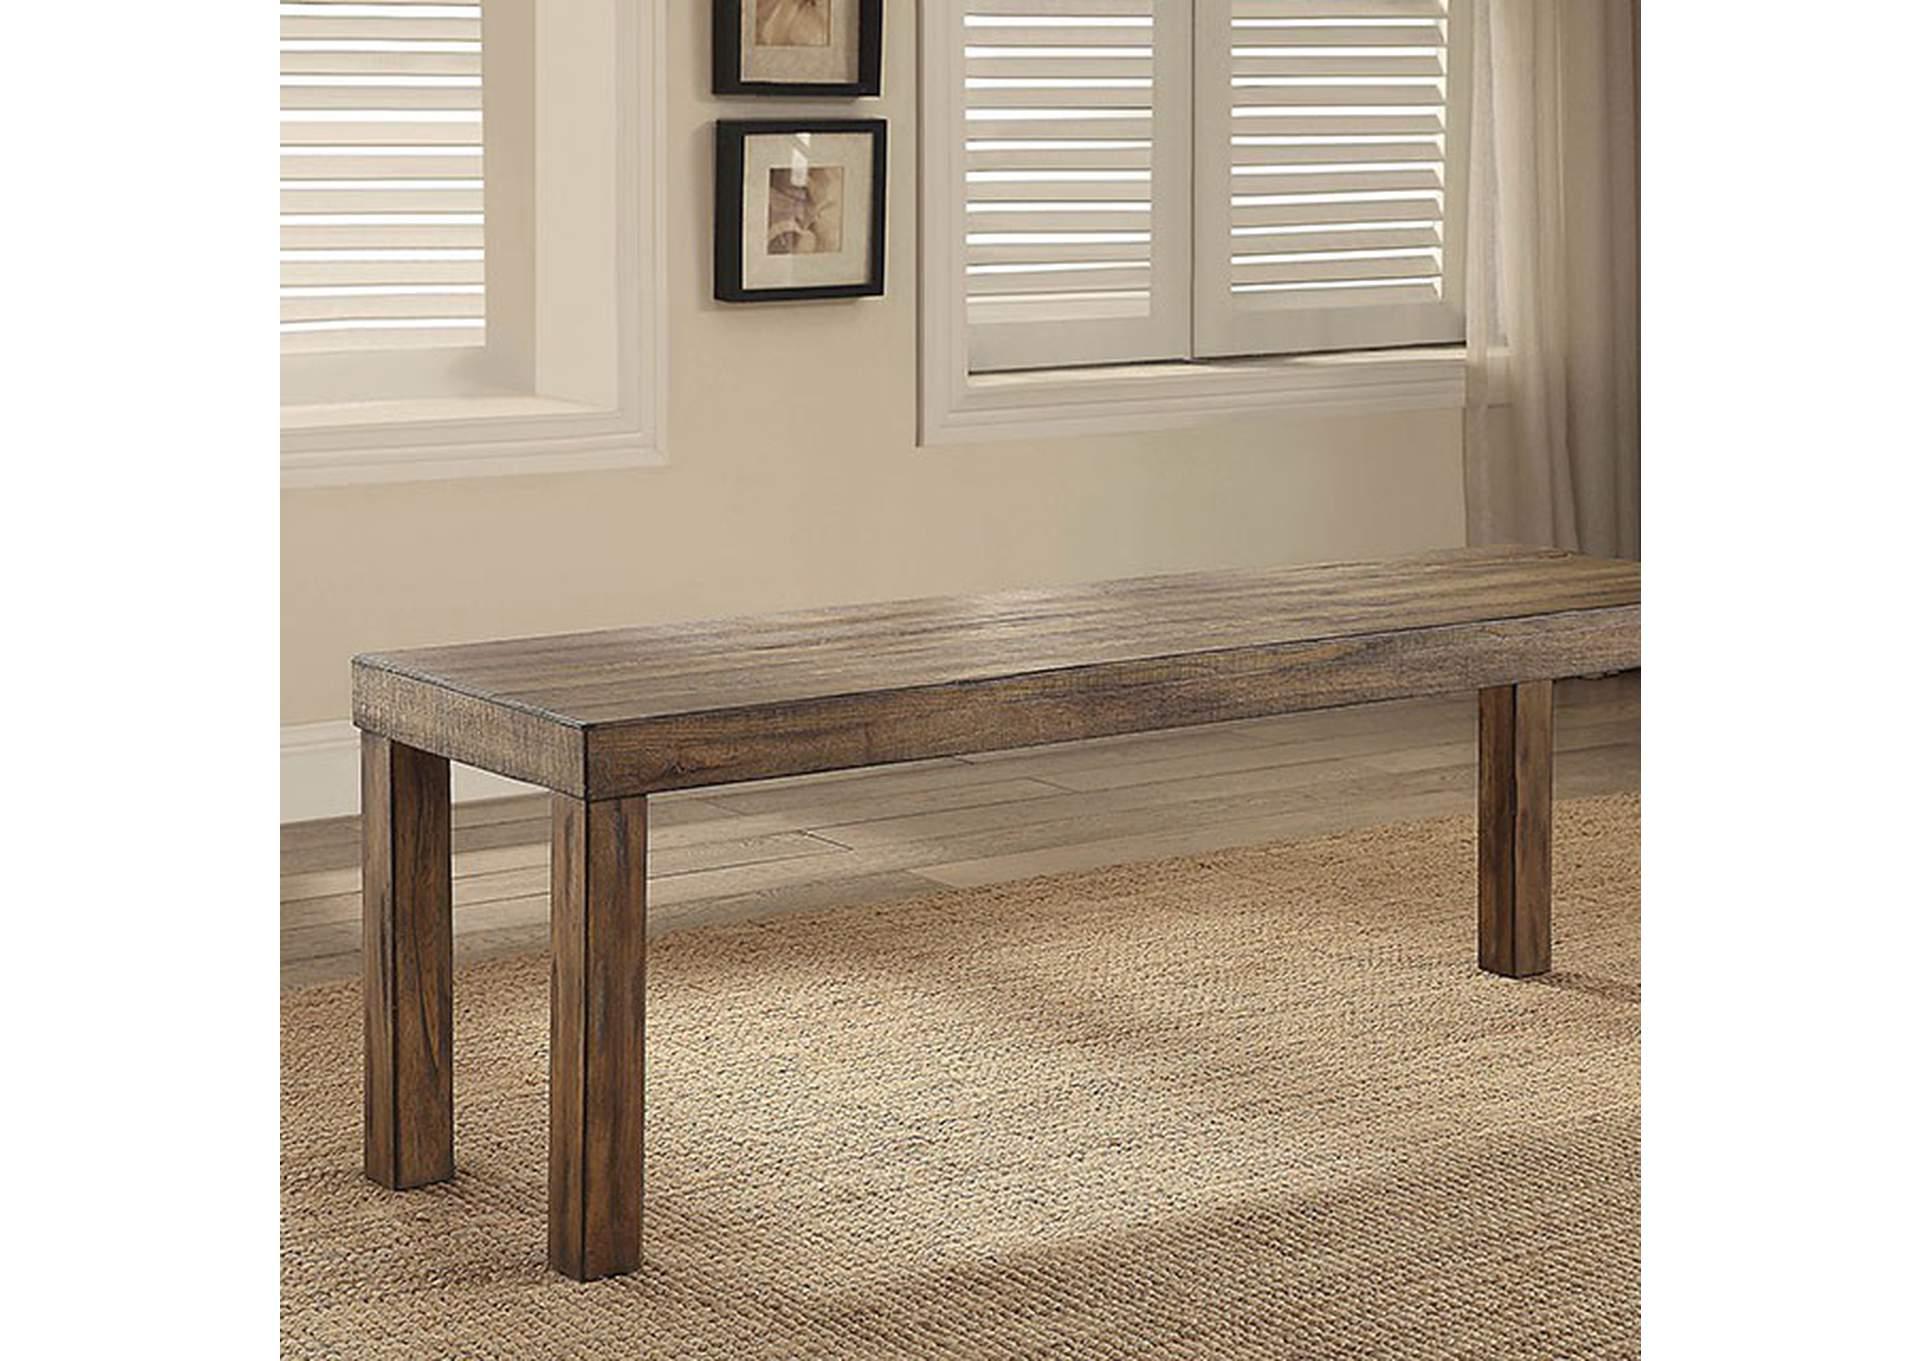 Surprising Vees Furniture Mattresses Colettte 58 Small Wooden Bench Short Links Chair Design For Home Short Linksinfo